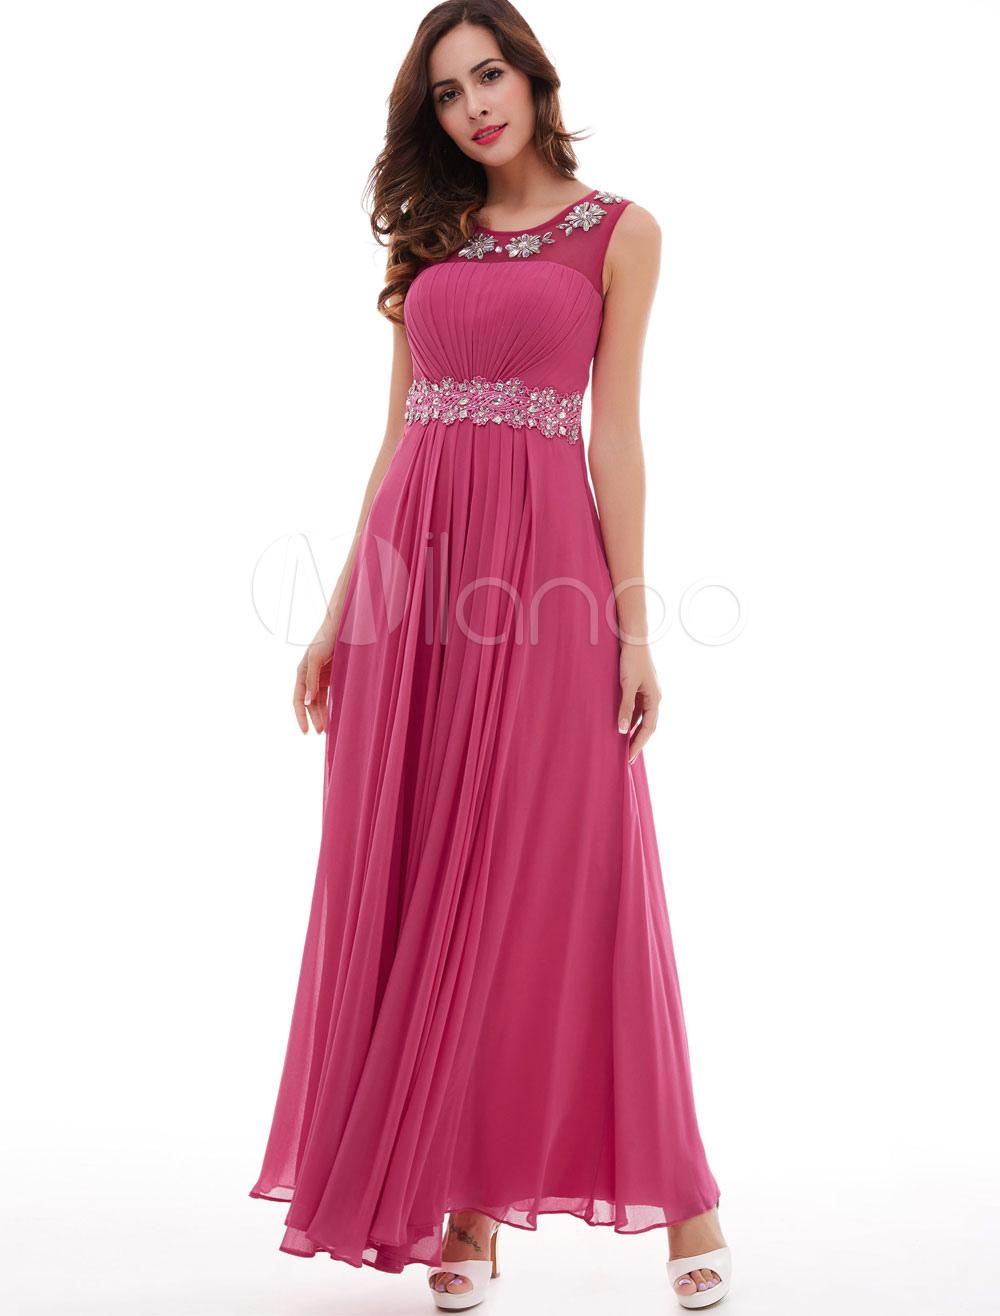 Prom Dresses Long Chiffon Hot Pink Beading Sleevelss Floor Length Formal Party Dress (Wedding Cheap Party Dress) photo